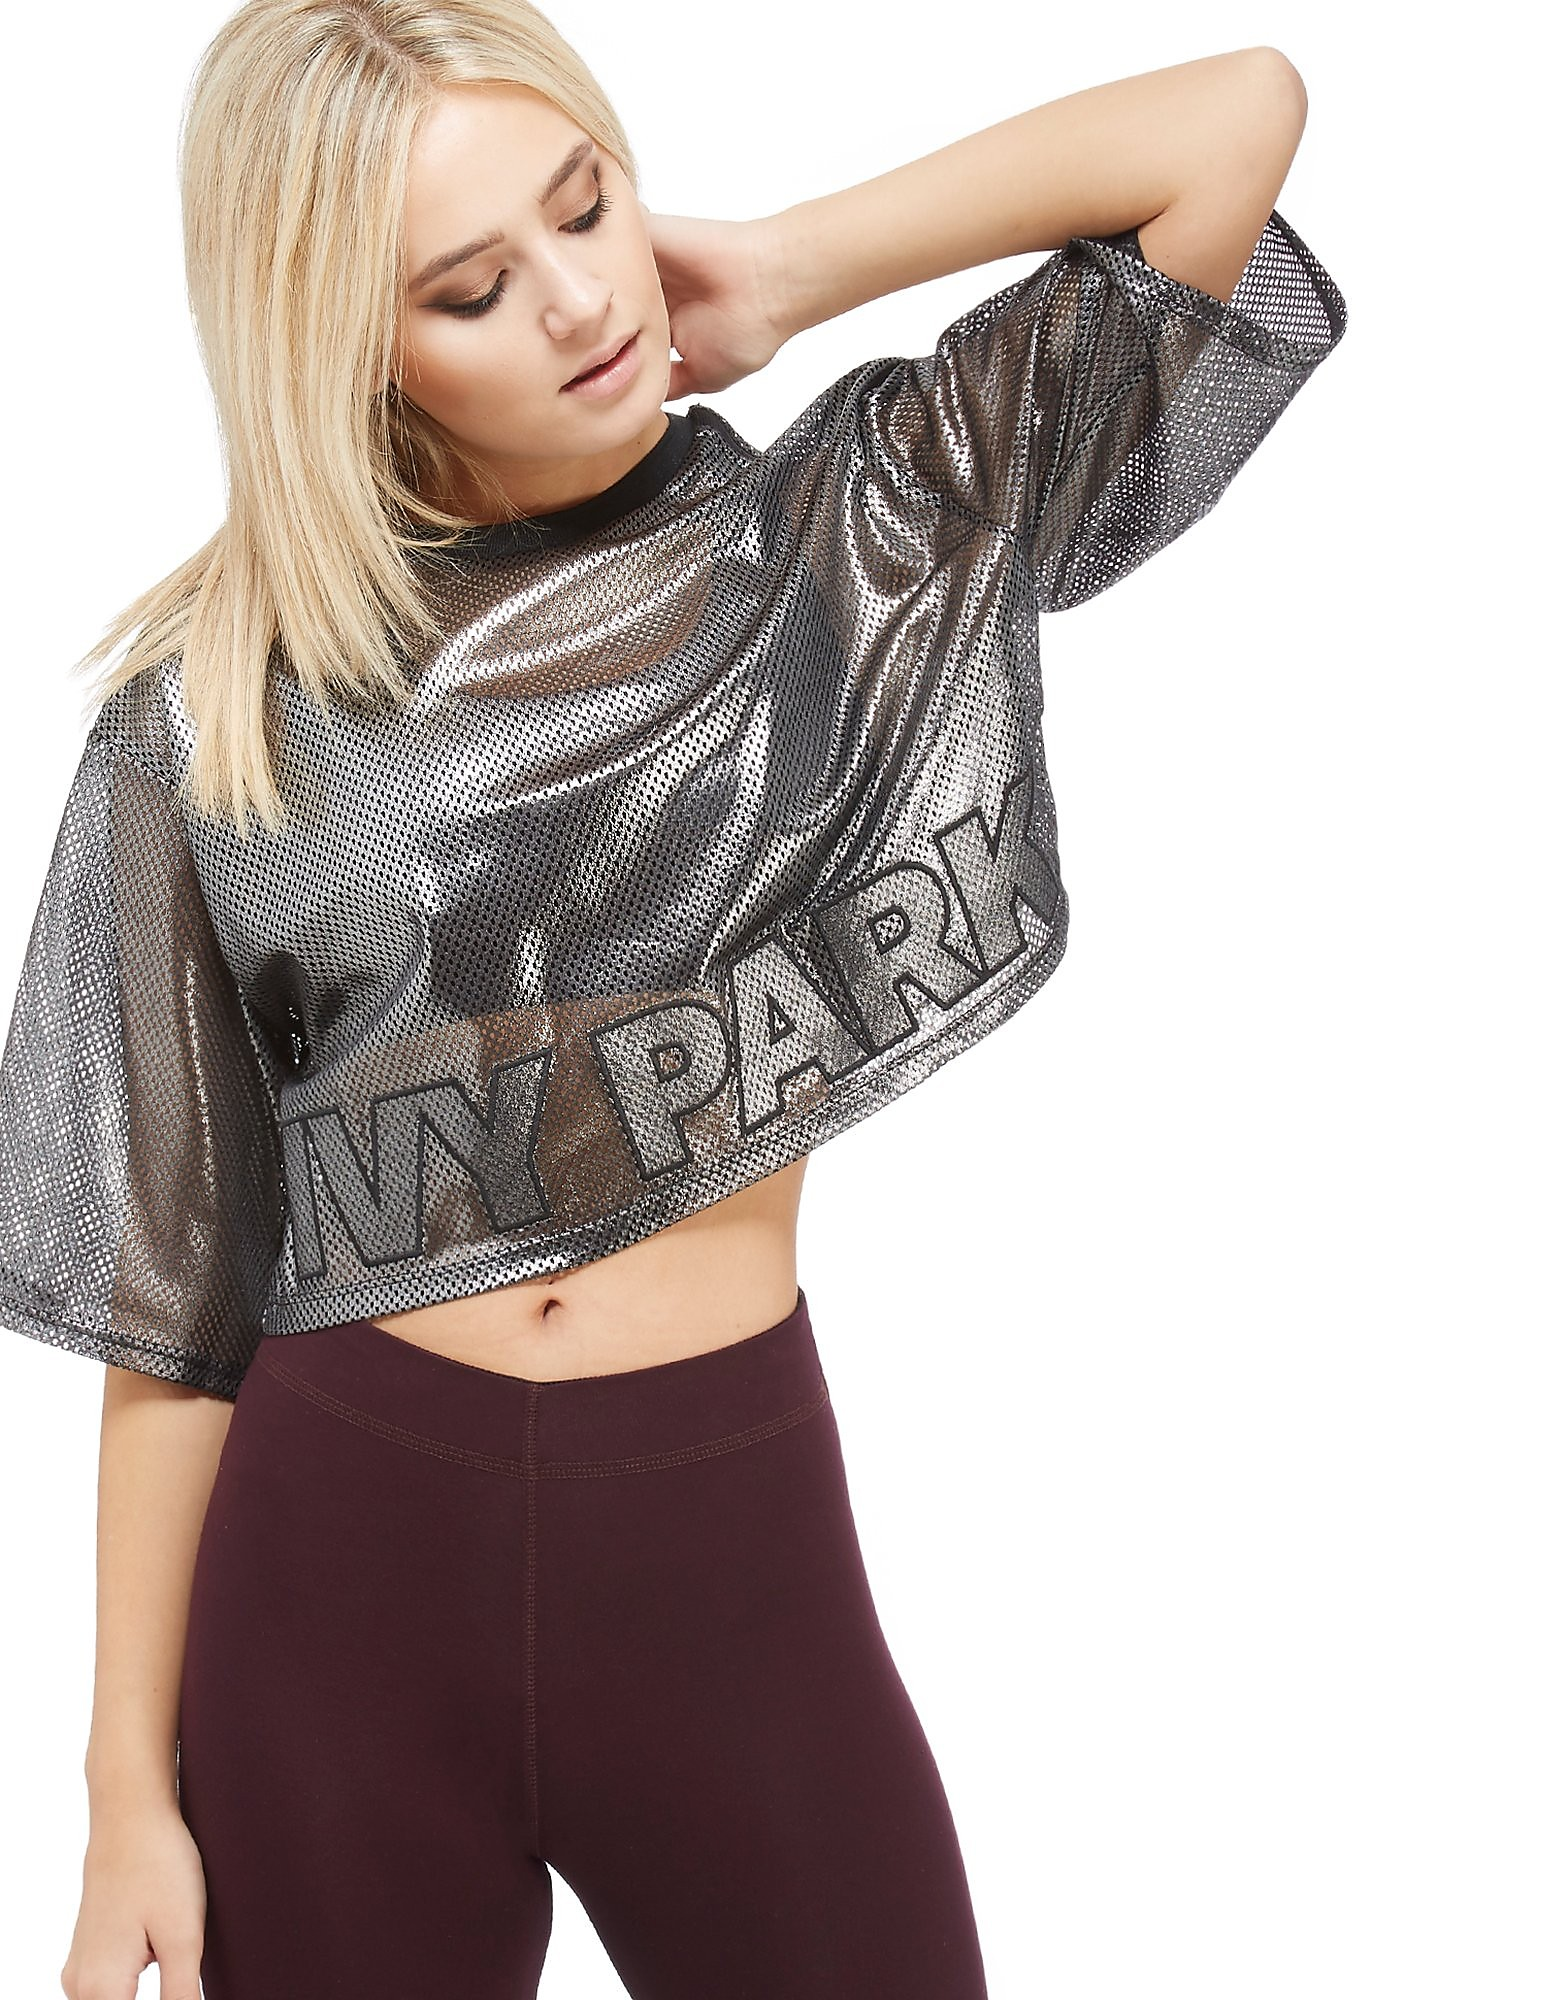 IVY PARK Boxy T-Shirt